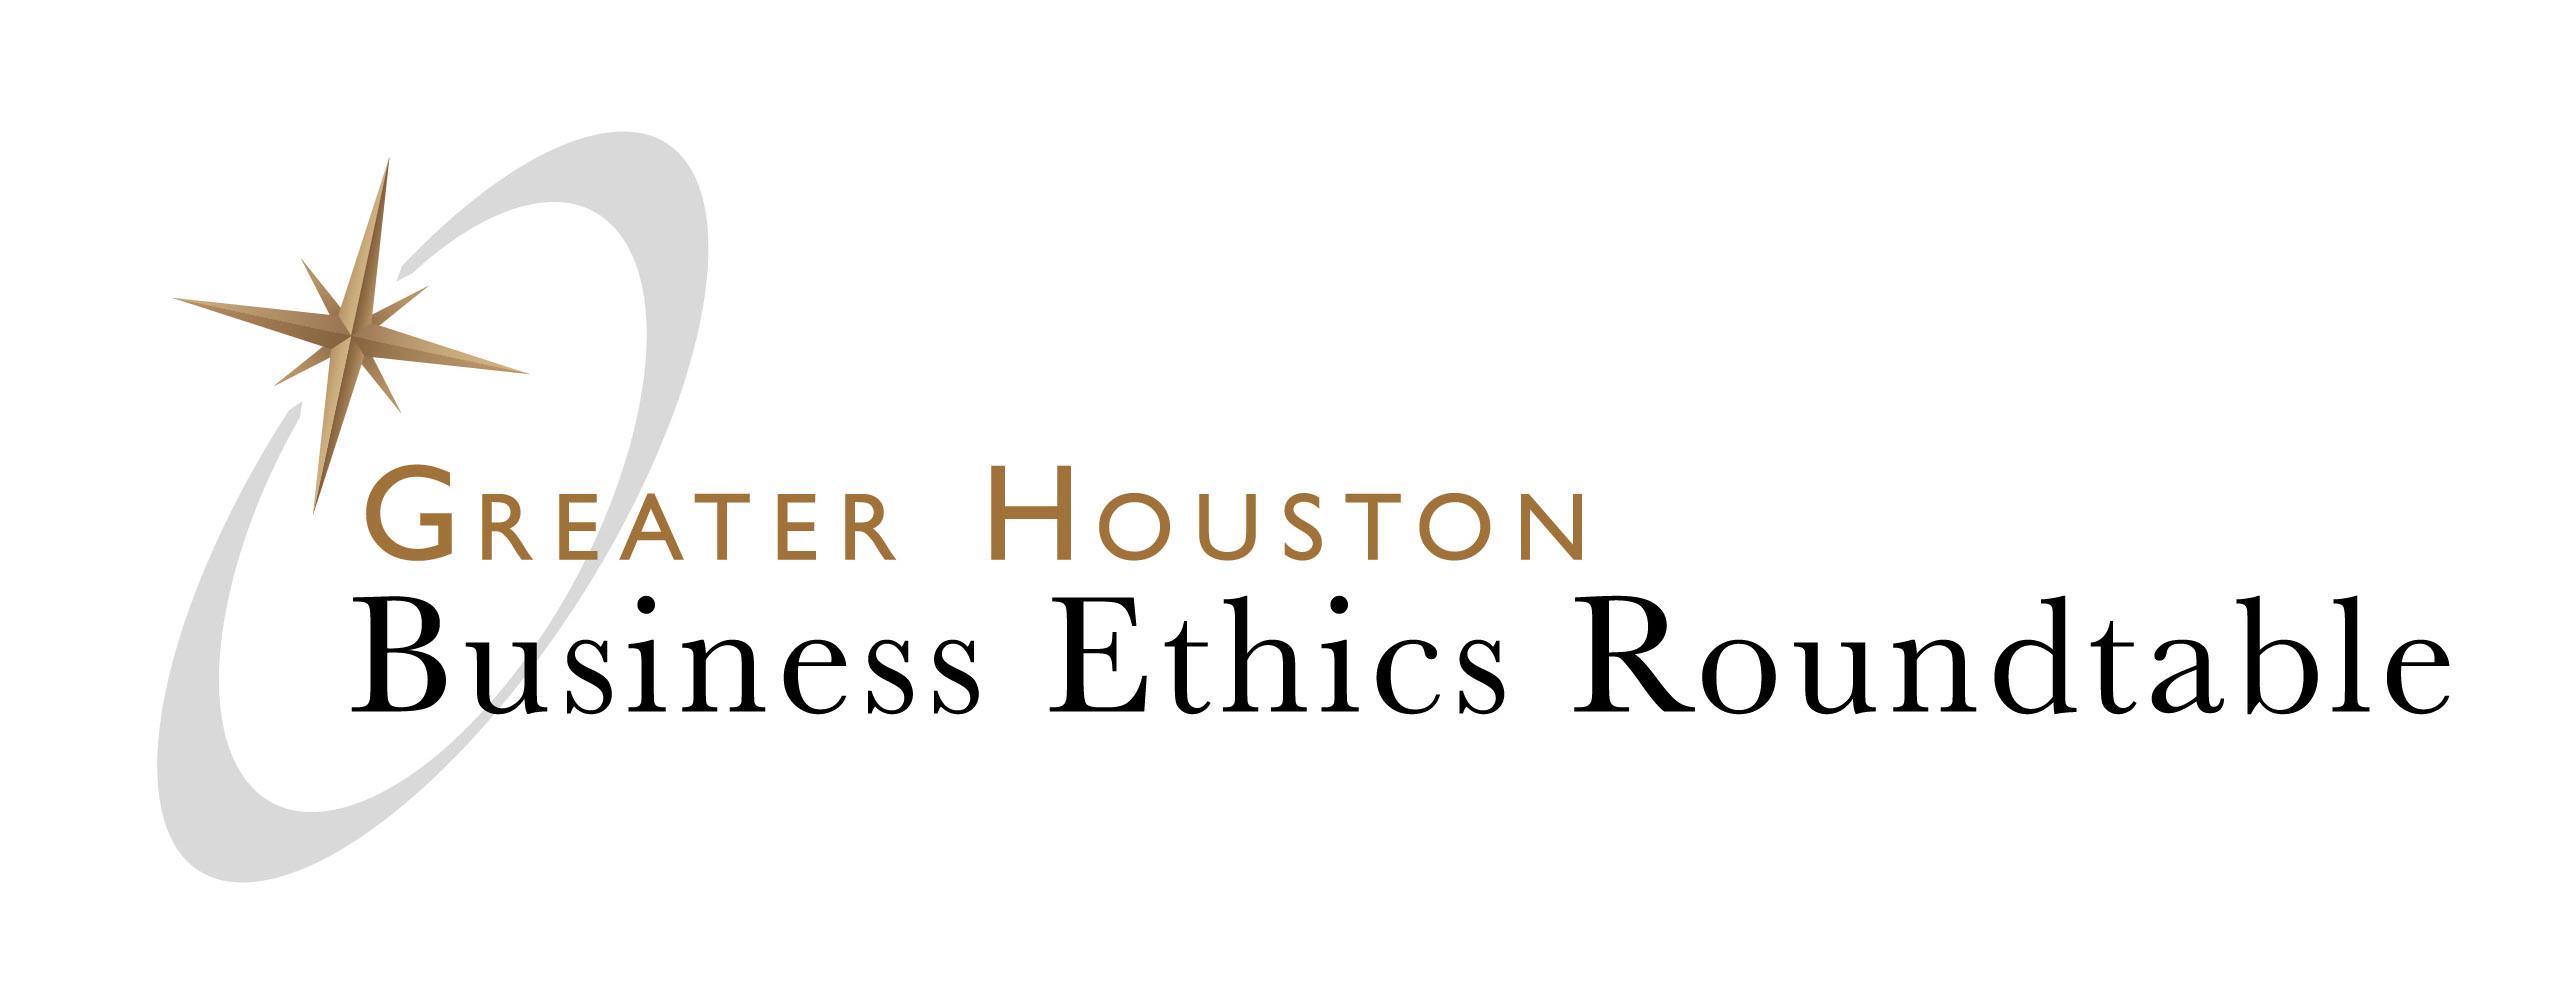 Greater Houston Business Ethics Roundtable